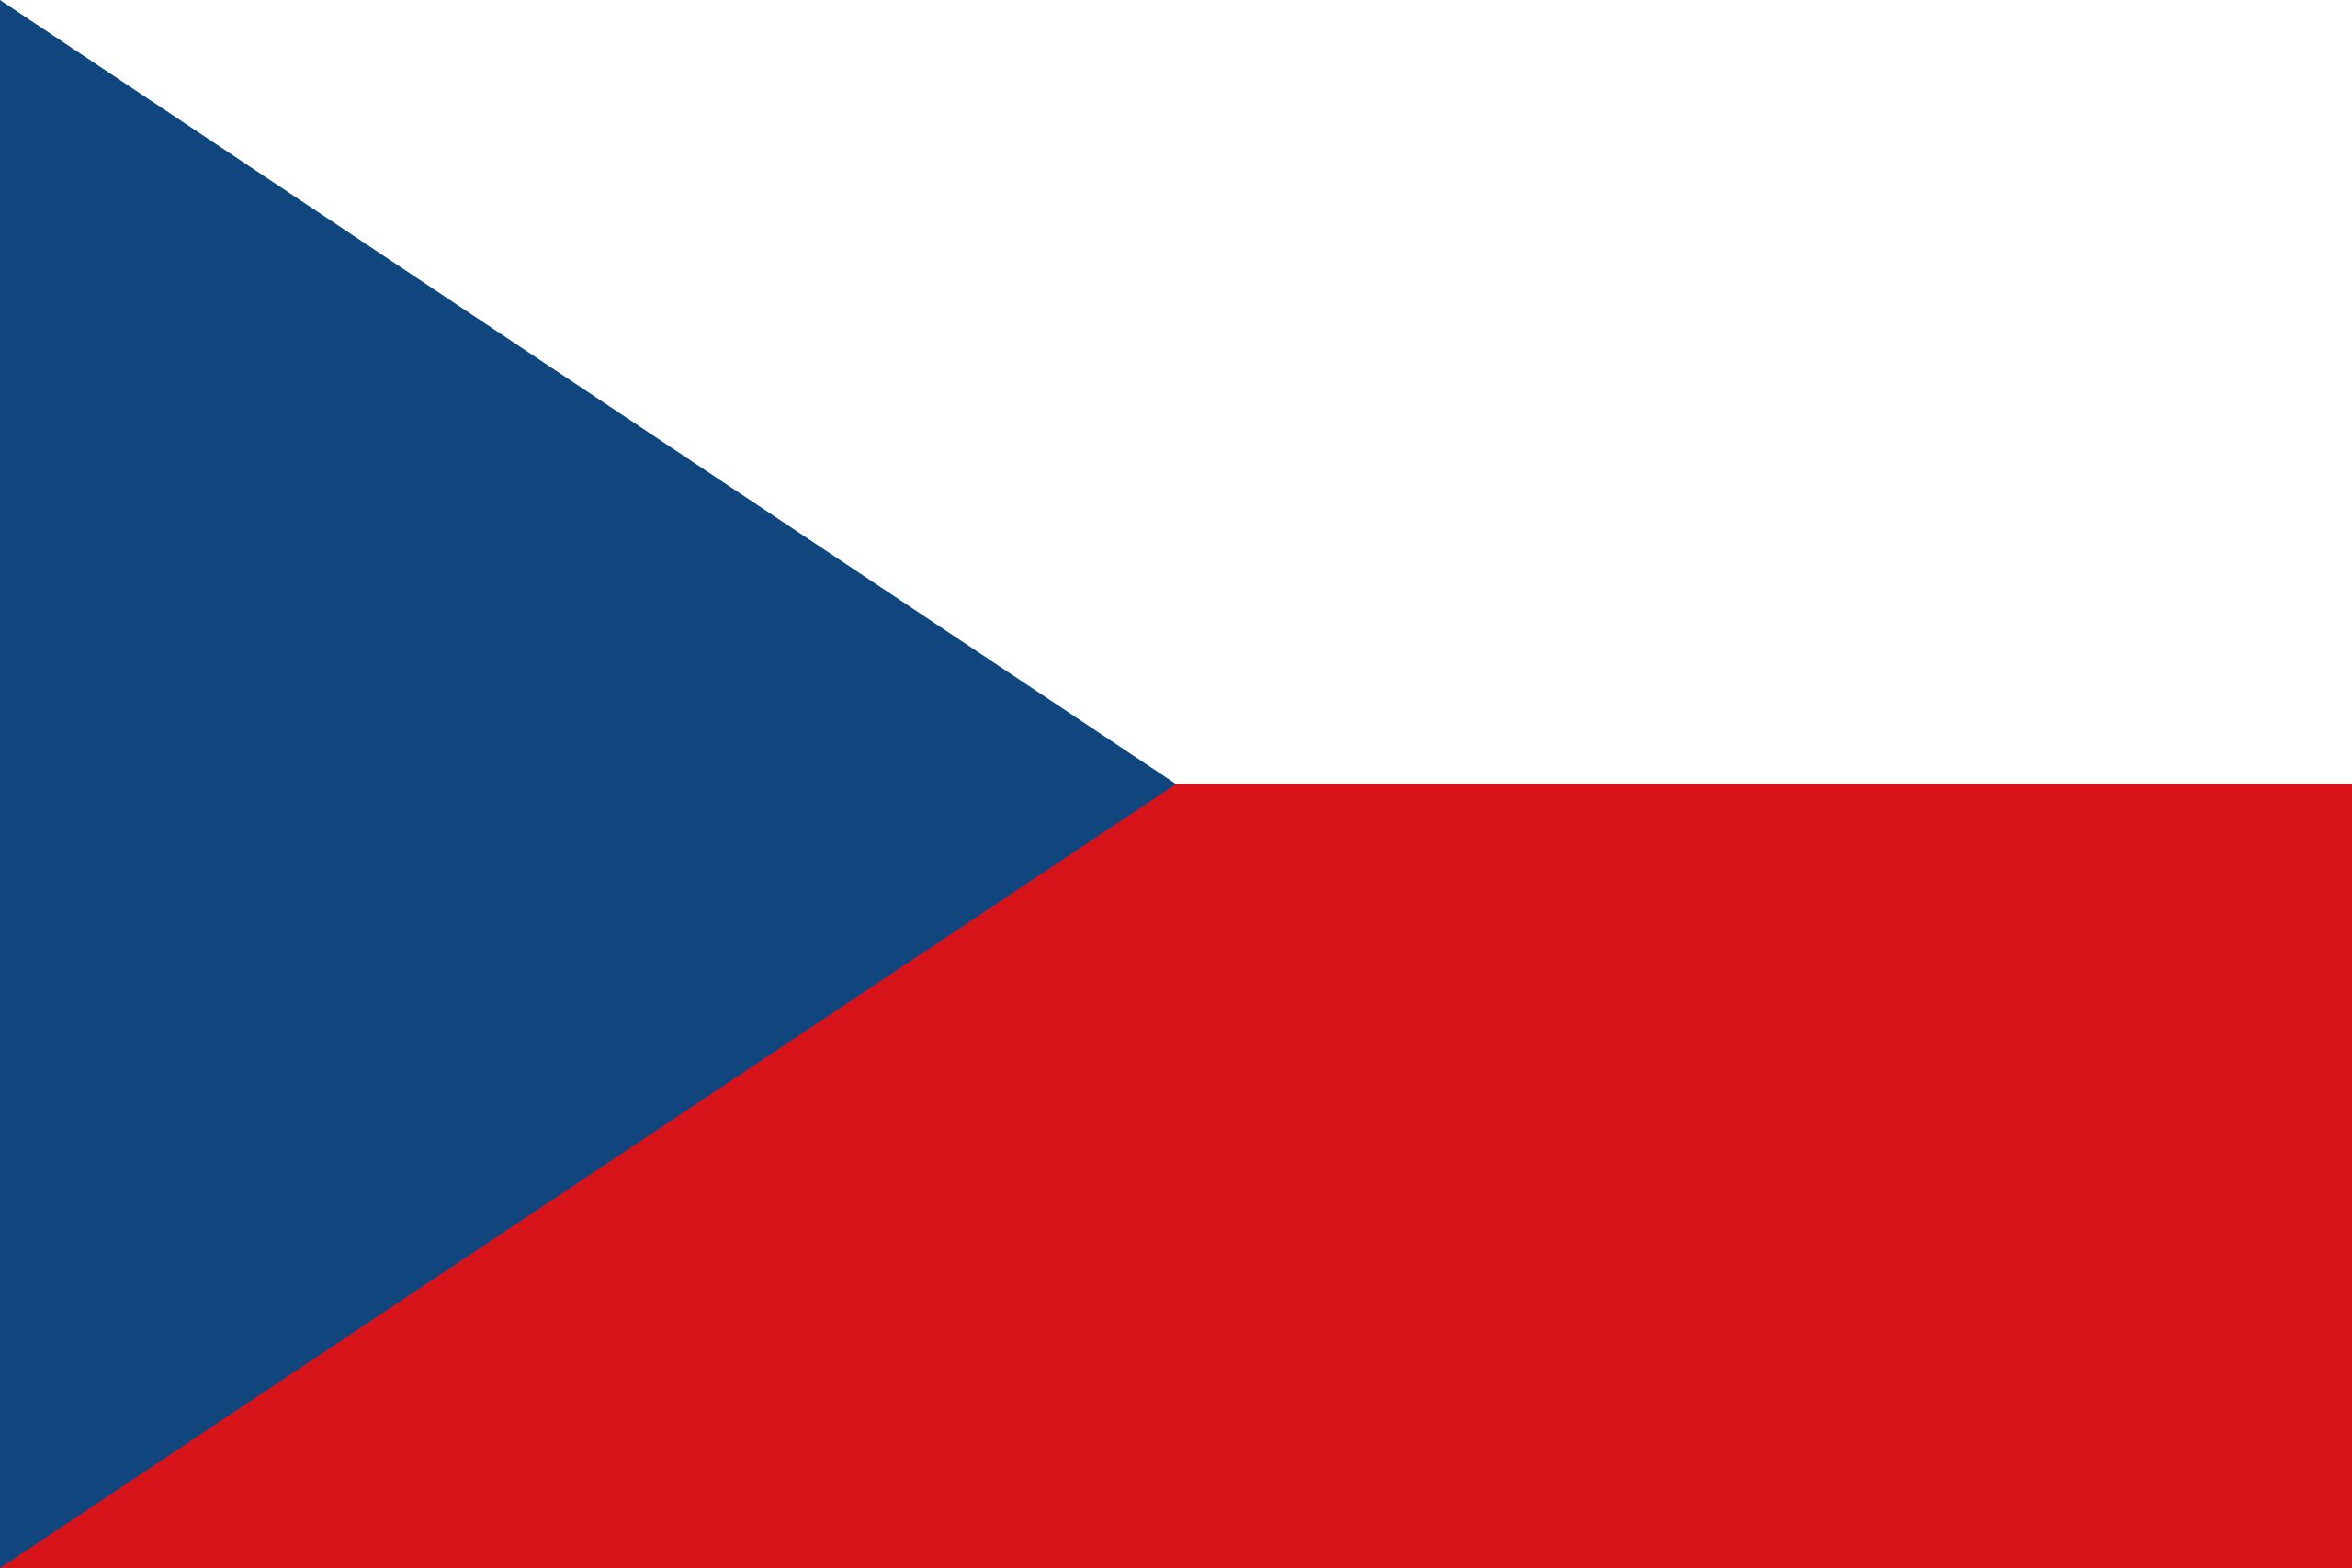 república checa, देश, emblema, लोग�प्रतीकbolo - HD वॉलपेपर - प्रोफेसर-falken.com